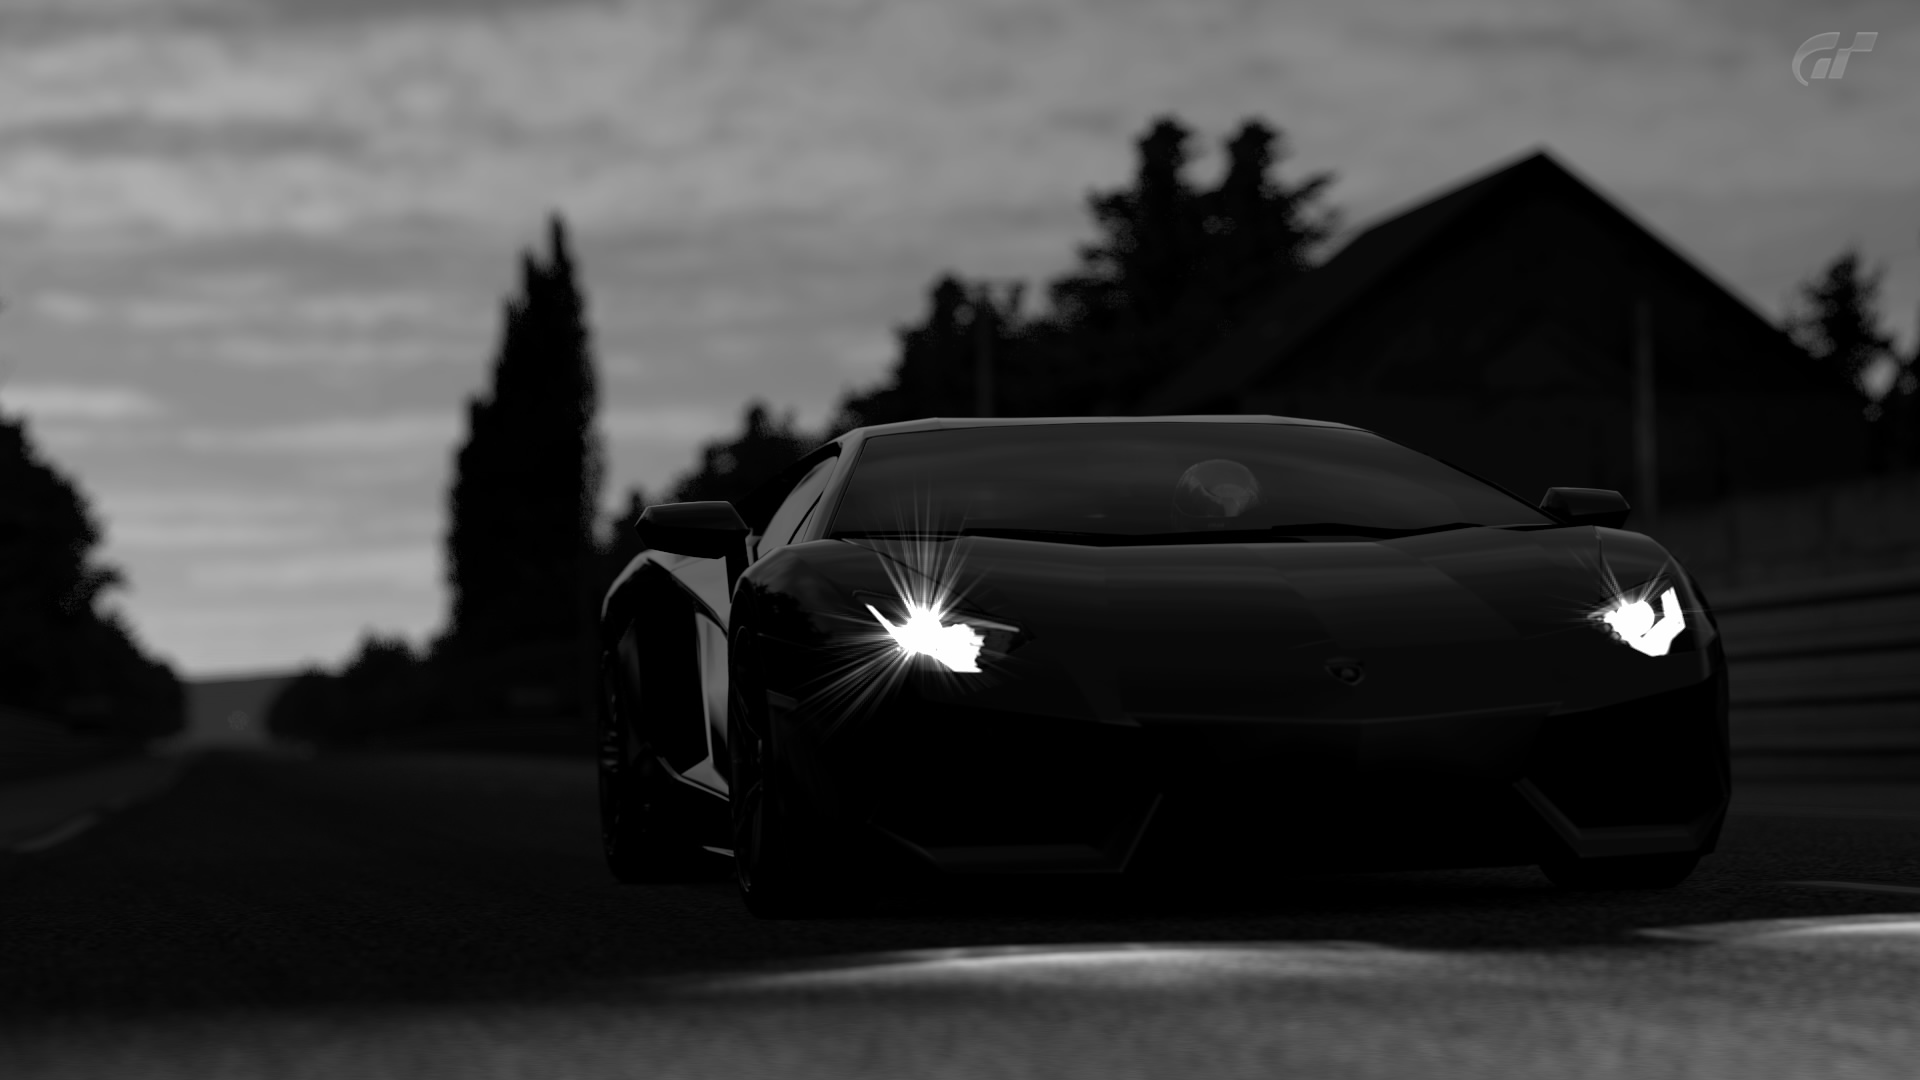 Lamborghini Dark wallpapers HD 1920x1080